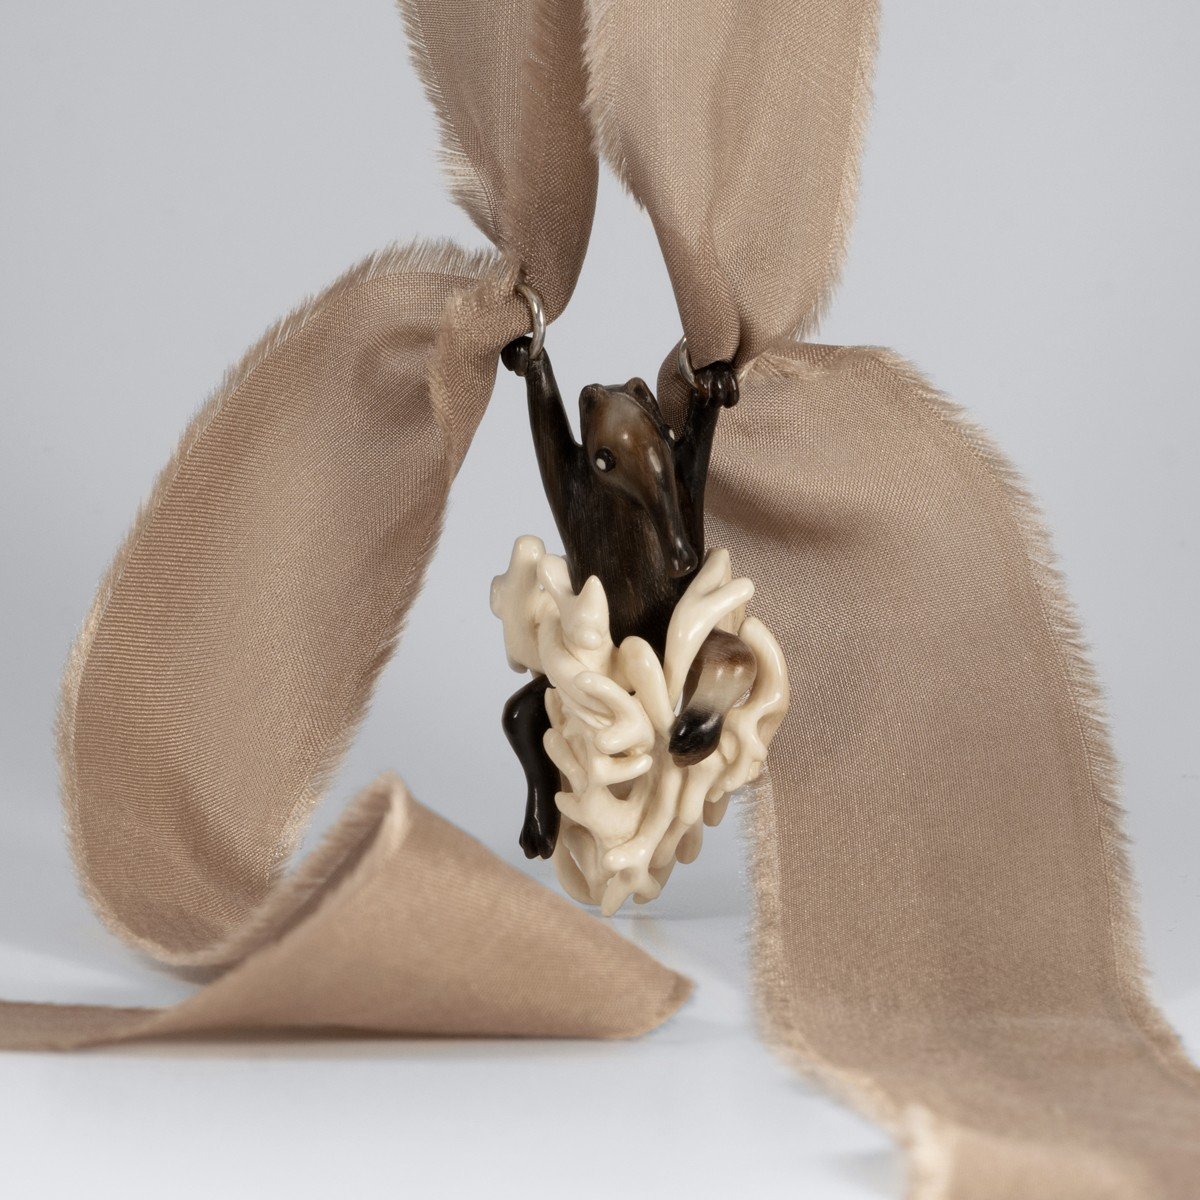 mamuto kaulo pakabukas